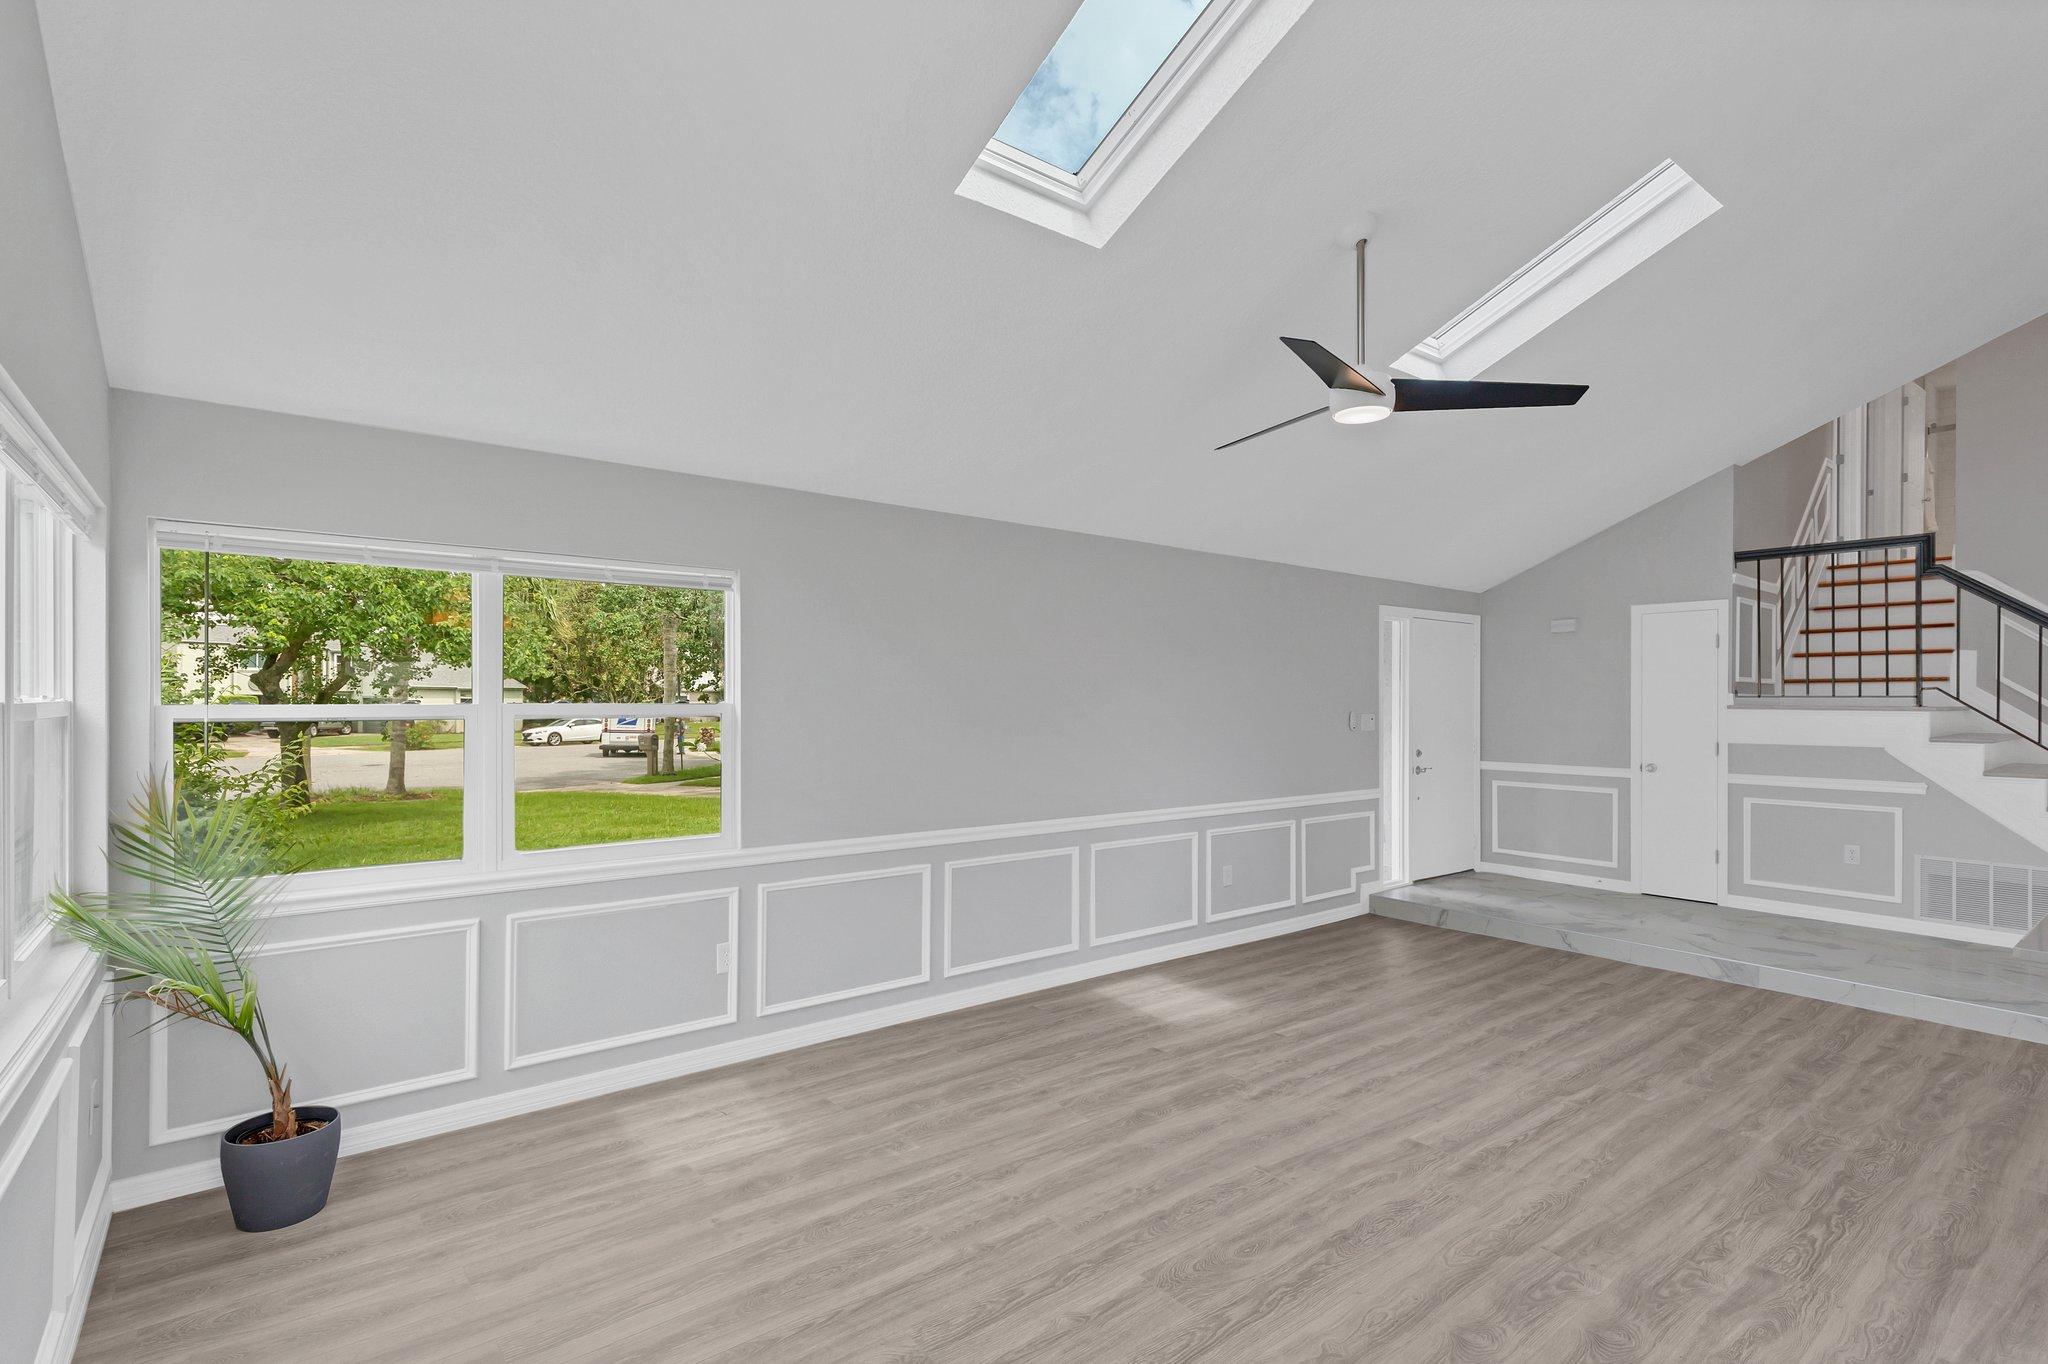 Custom woodwork creates an elegant feel to the space.